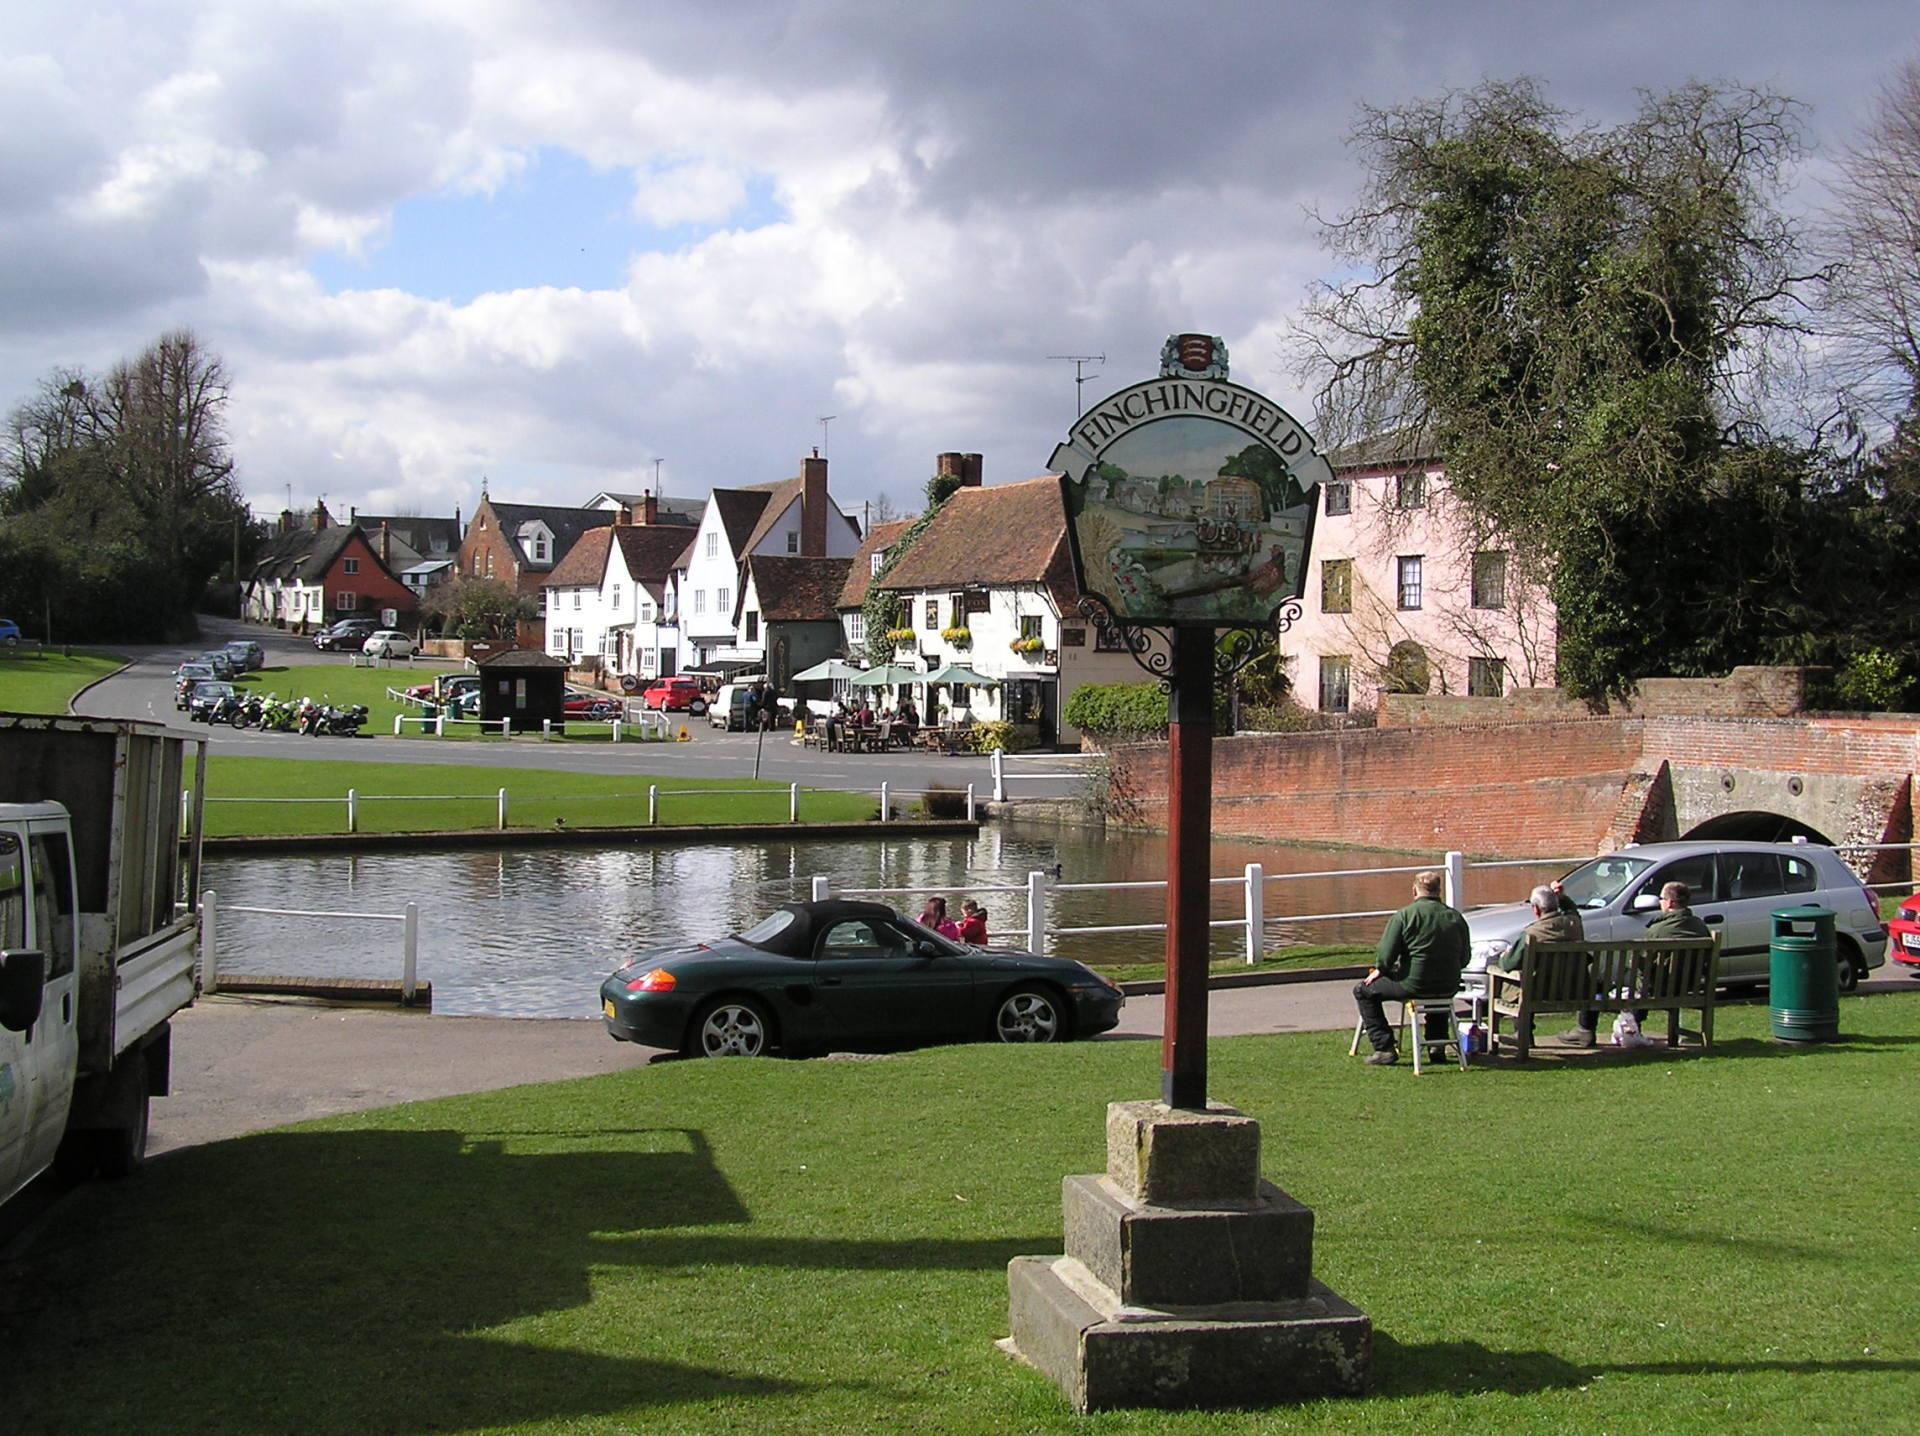 The Fox Inn Finchingfield